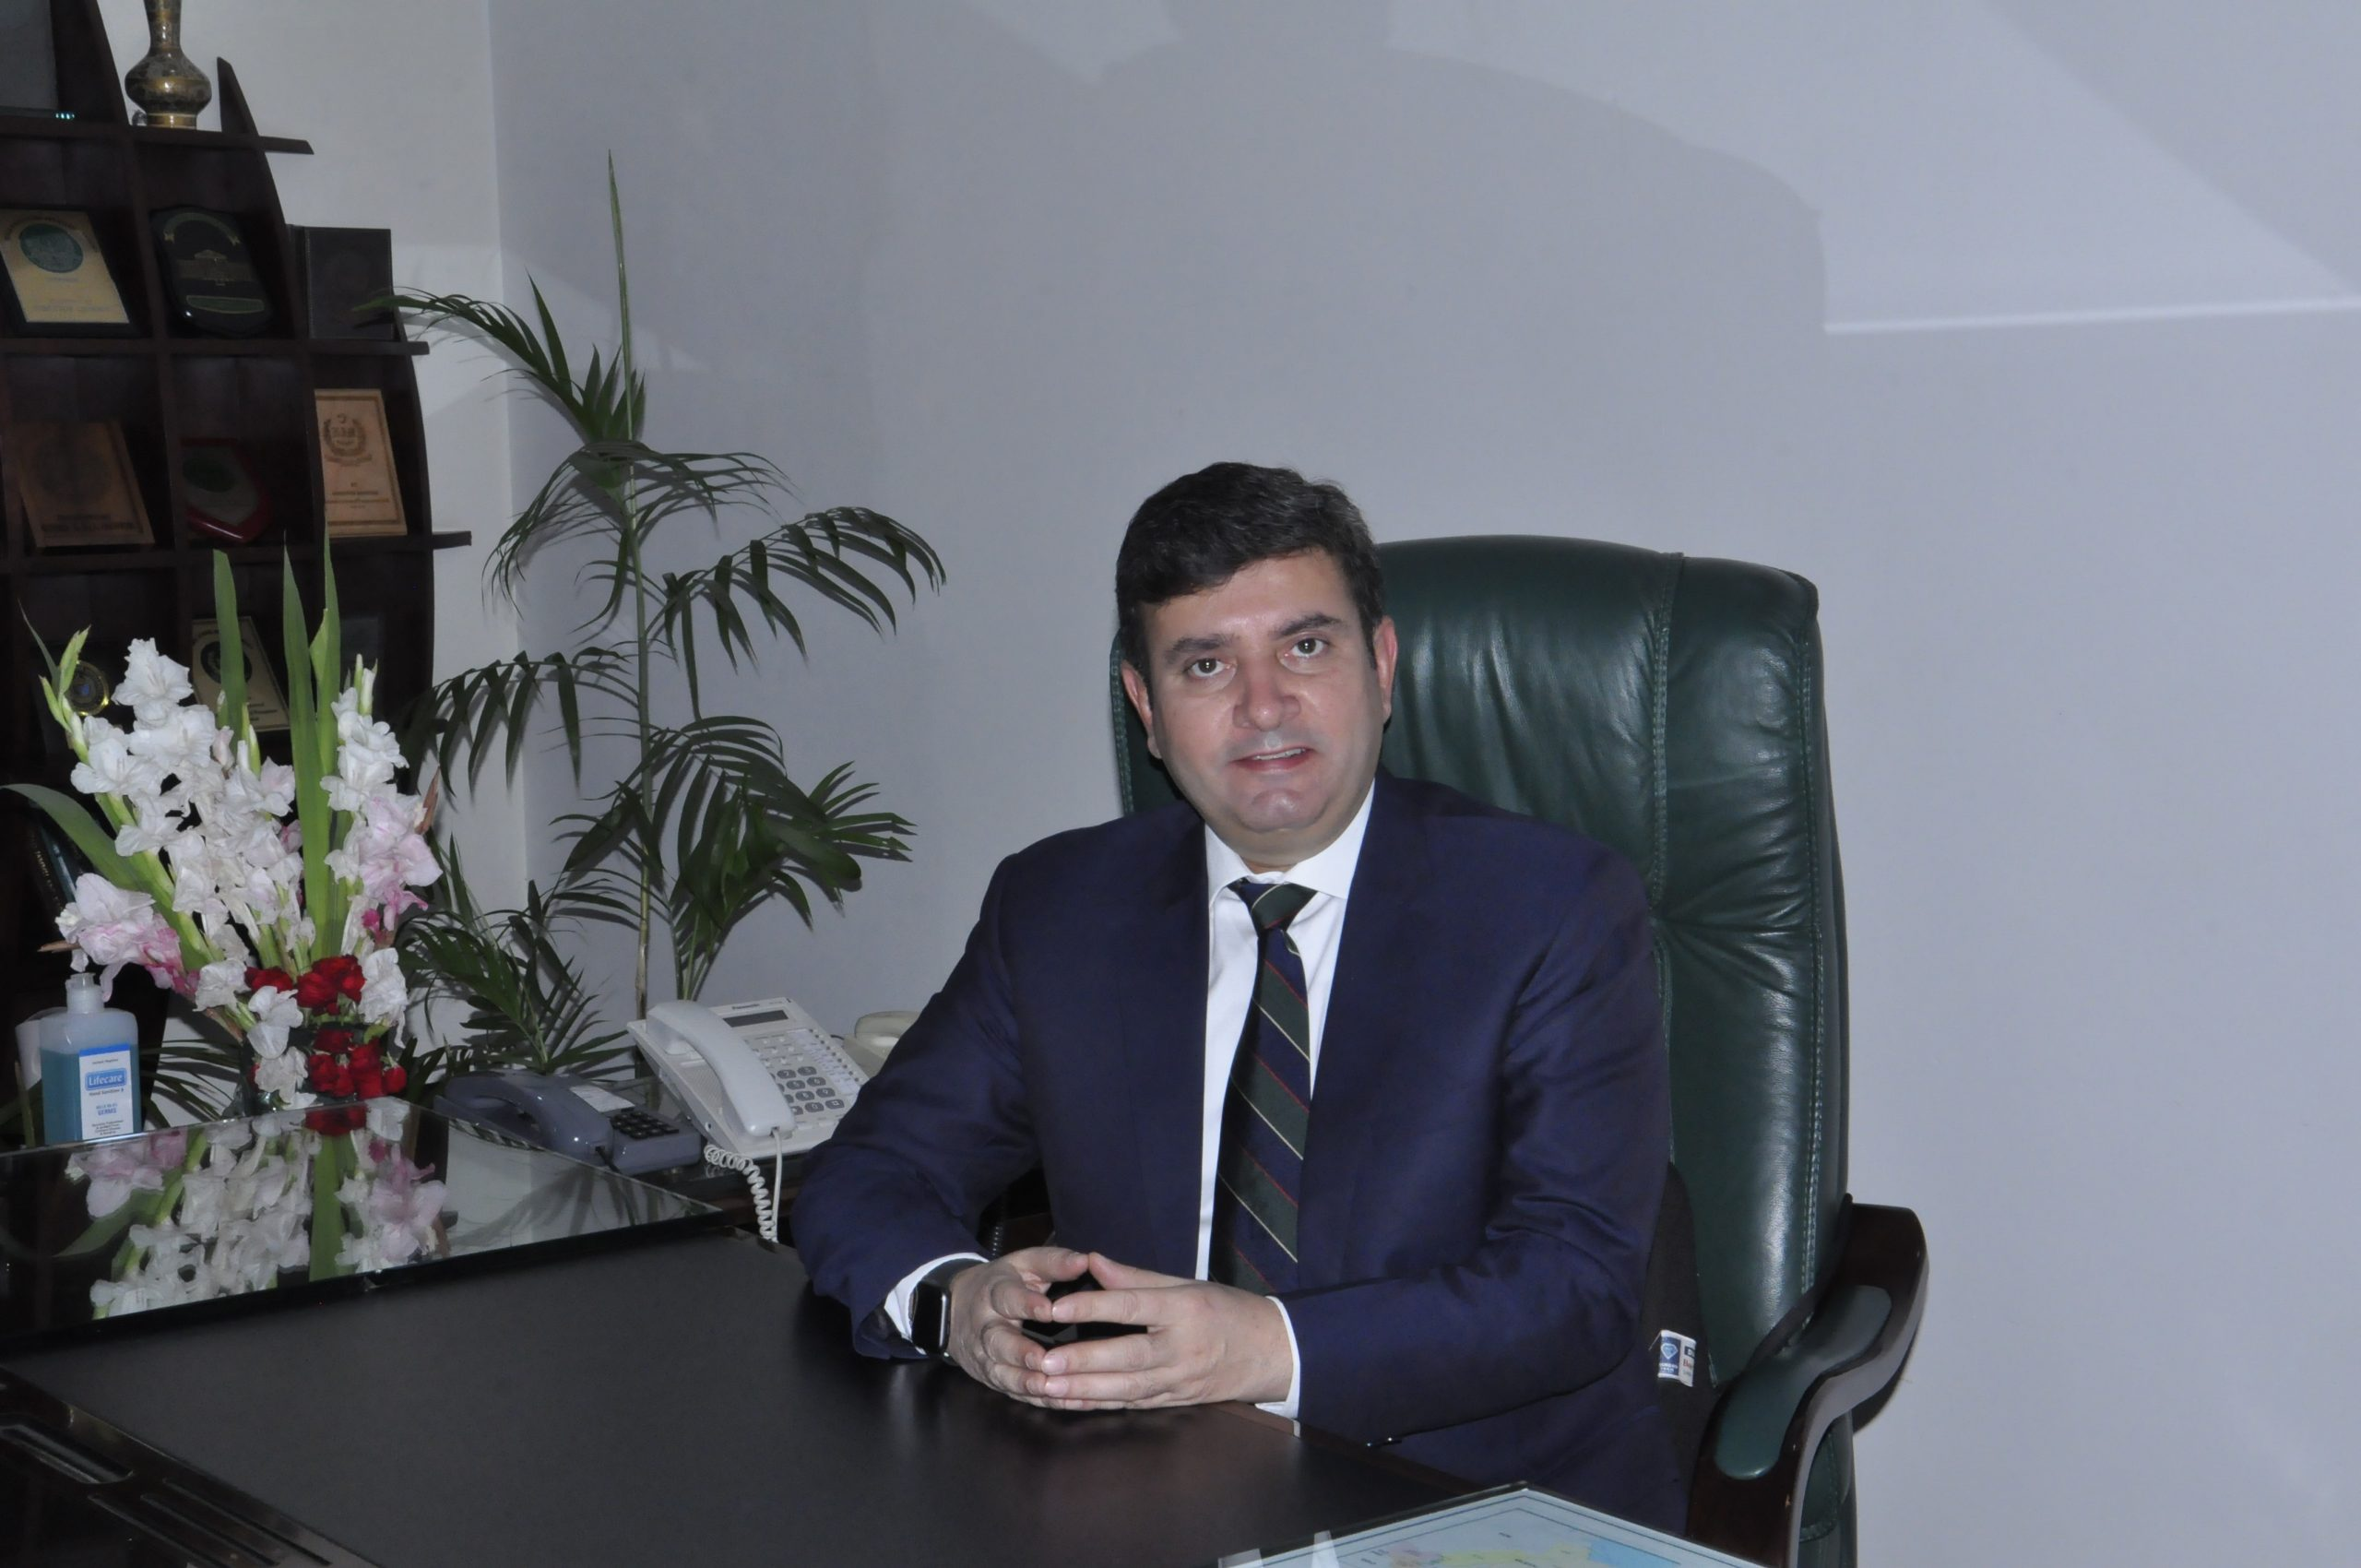 MR. Shakeel Qadir Khan